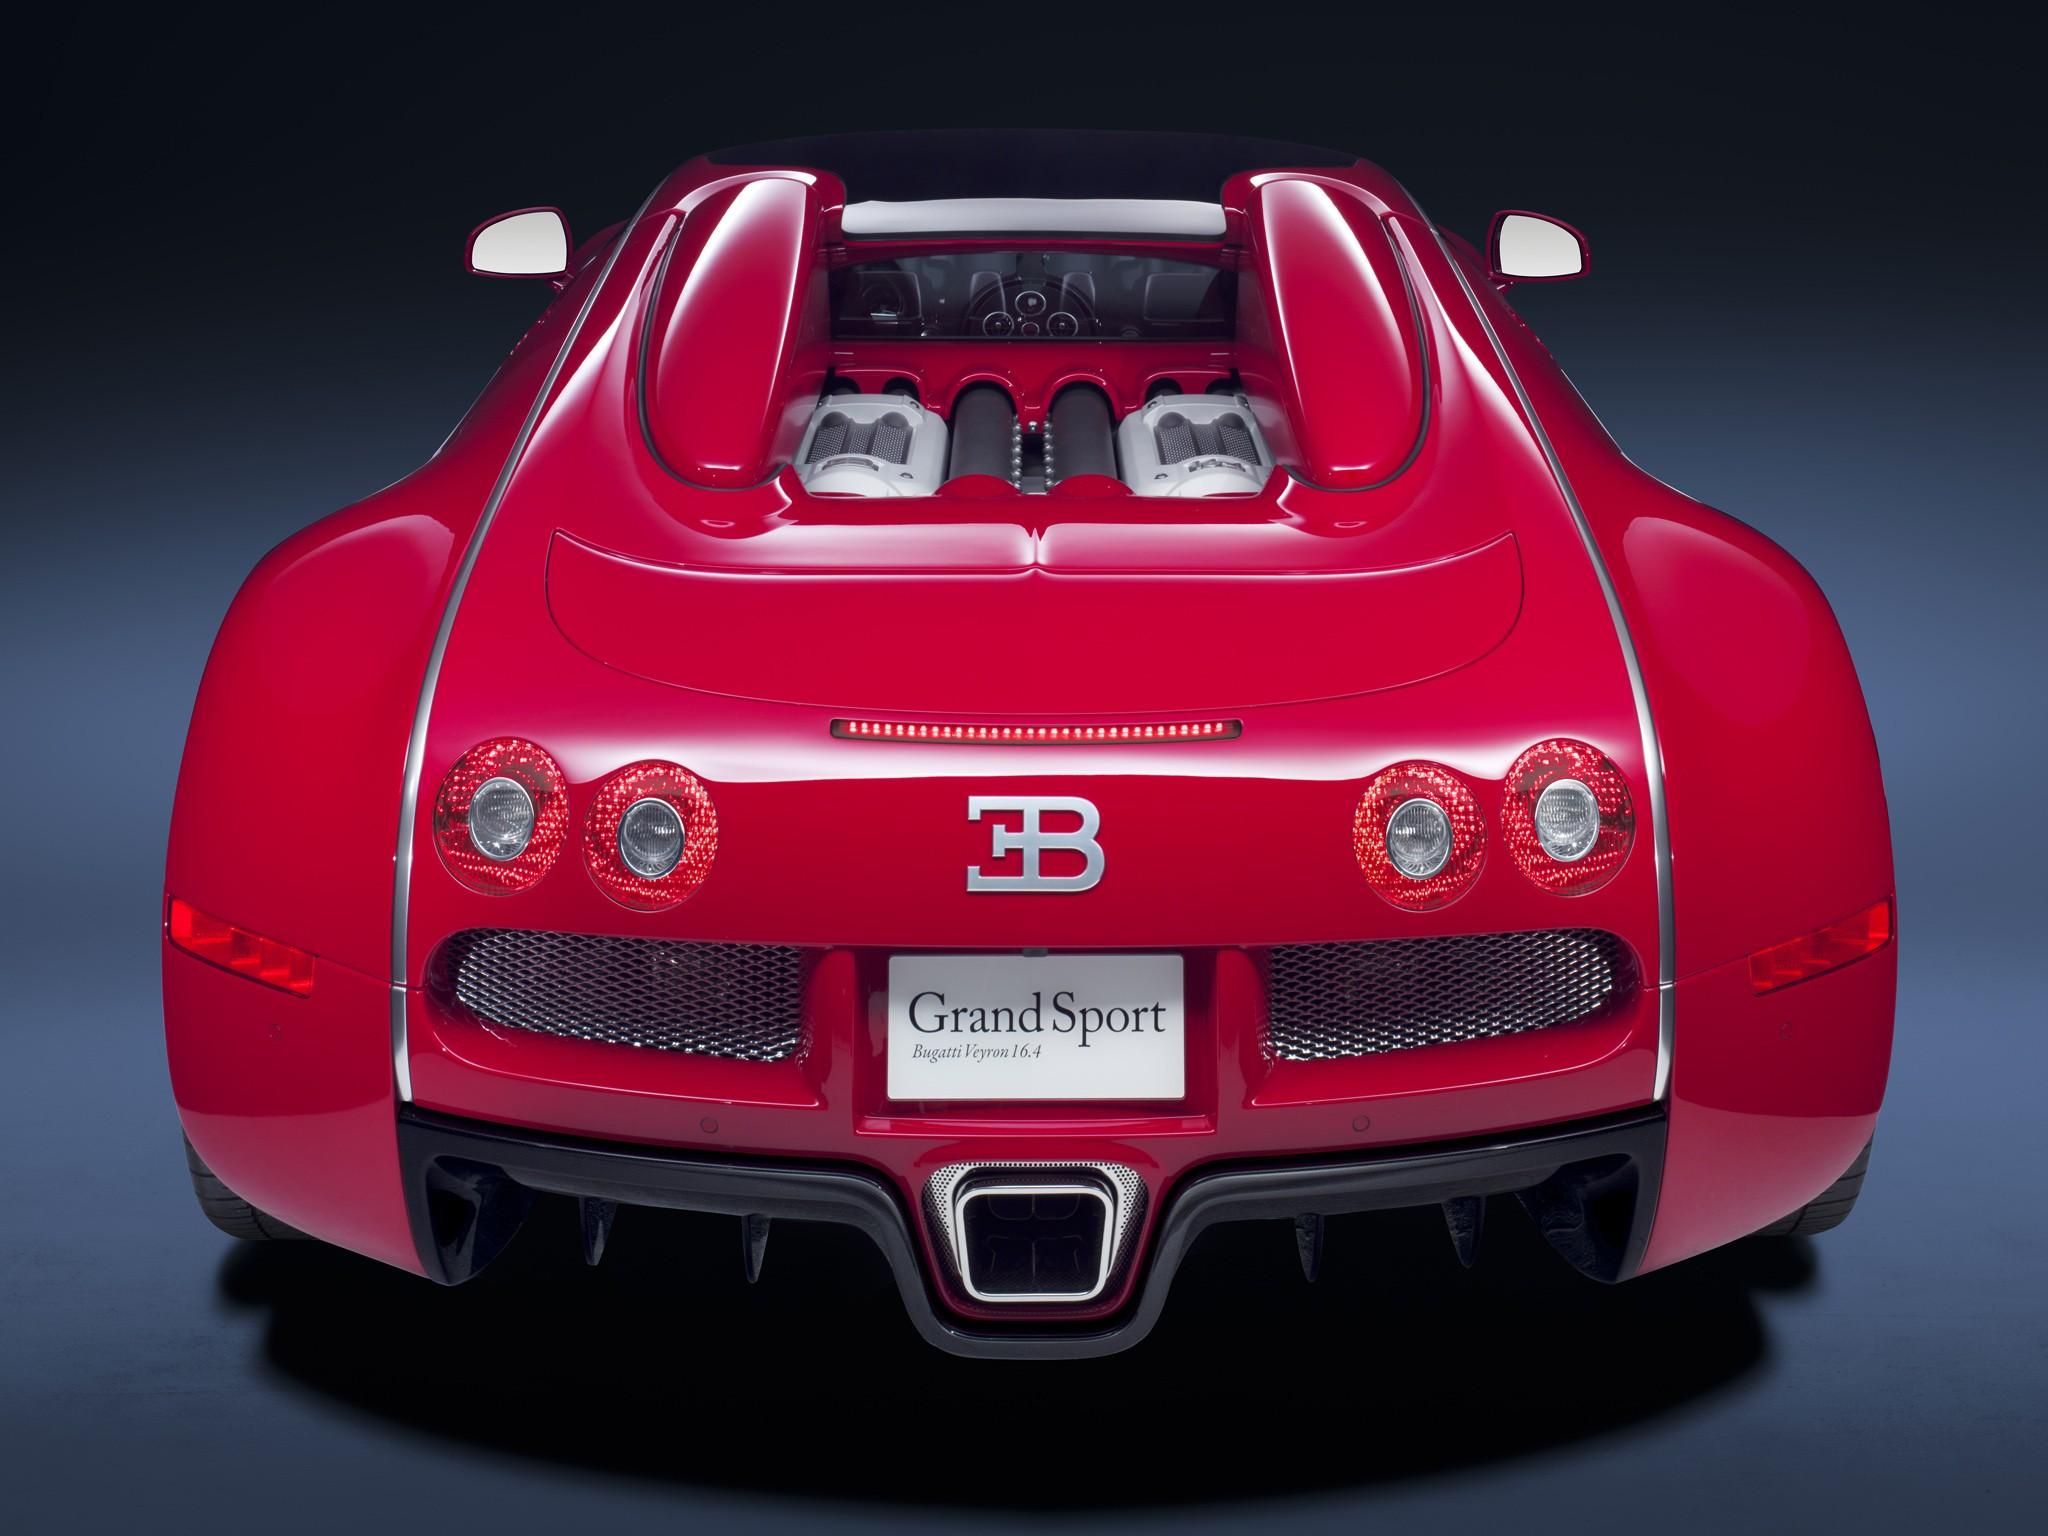 bugatti veyron grand sport specs photos 2009 2010 2011 2012 2013 2014 2015 autoevolution. Black Bedroom Furniture Sets. Home Design Ideas